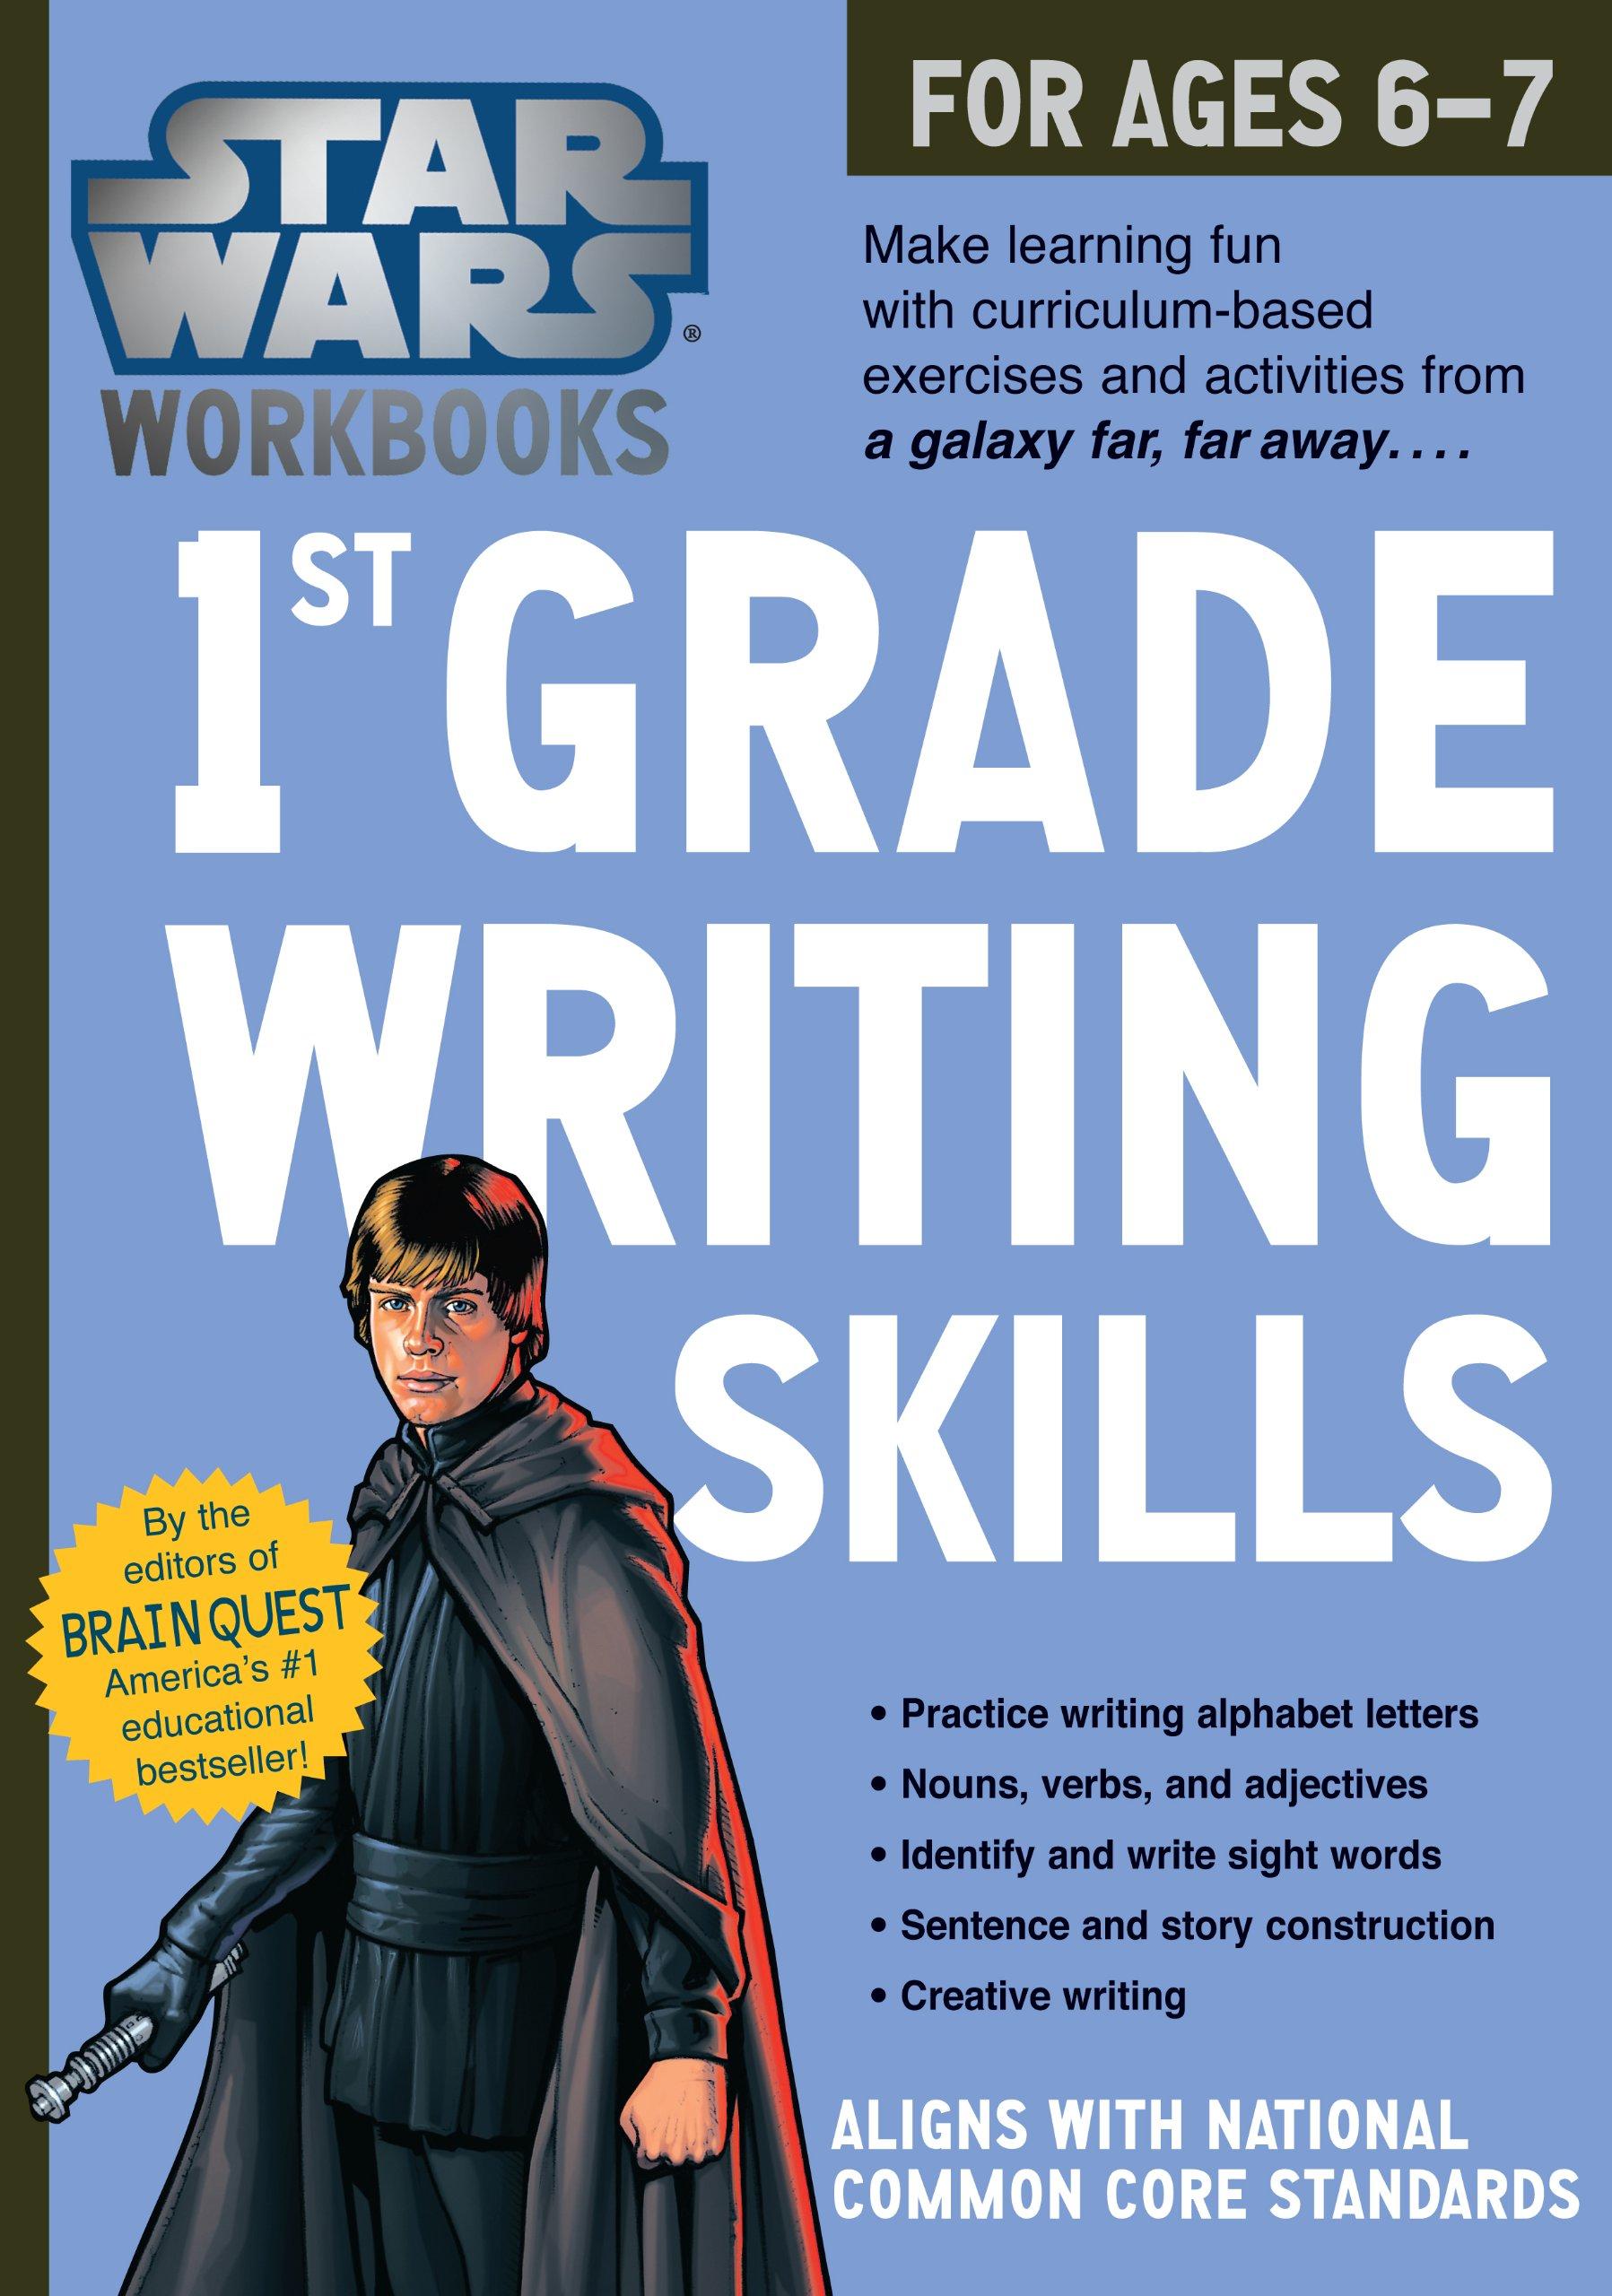 Star Wars Workbook: 1st Grade Writing Skills (Star Wars Workbooks)